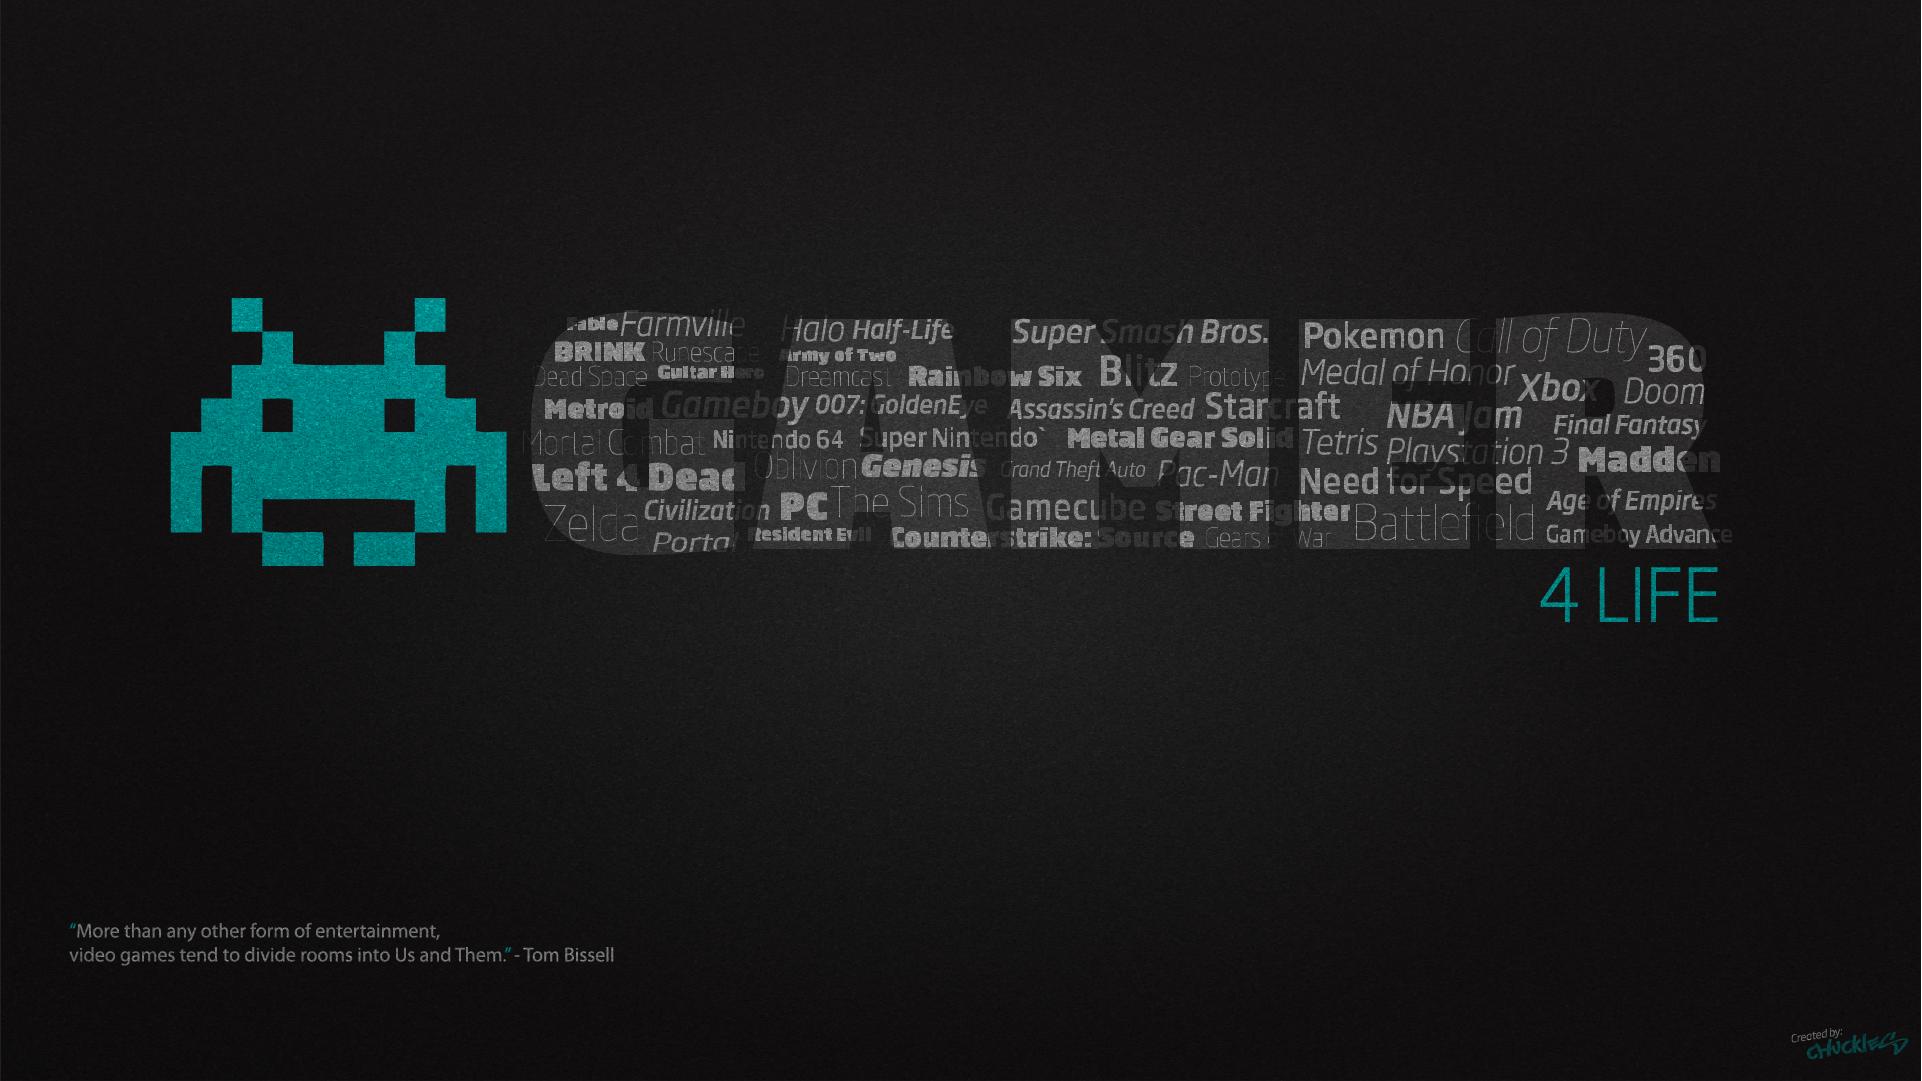 Best Gamer For Life Desktop Wallpaper By Chucklesmedia On Deviantart